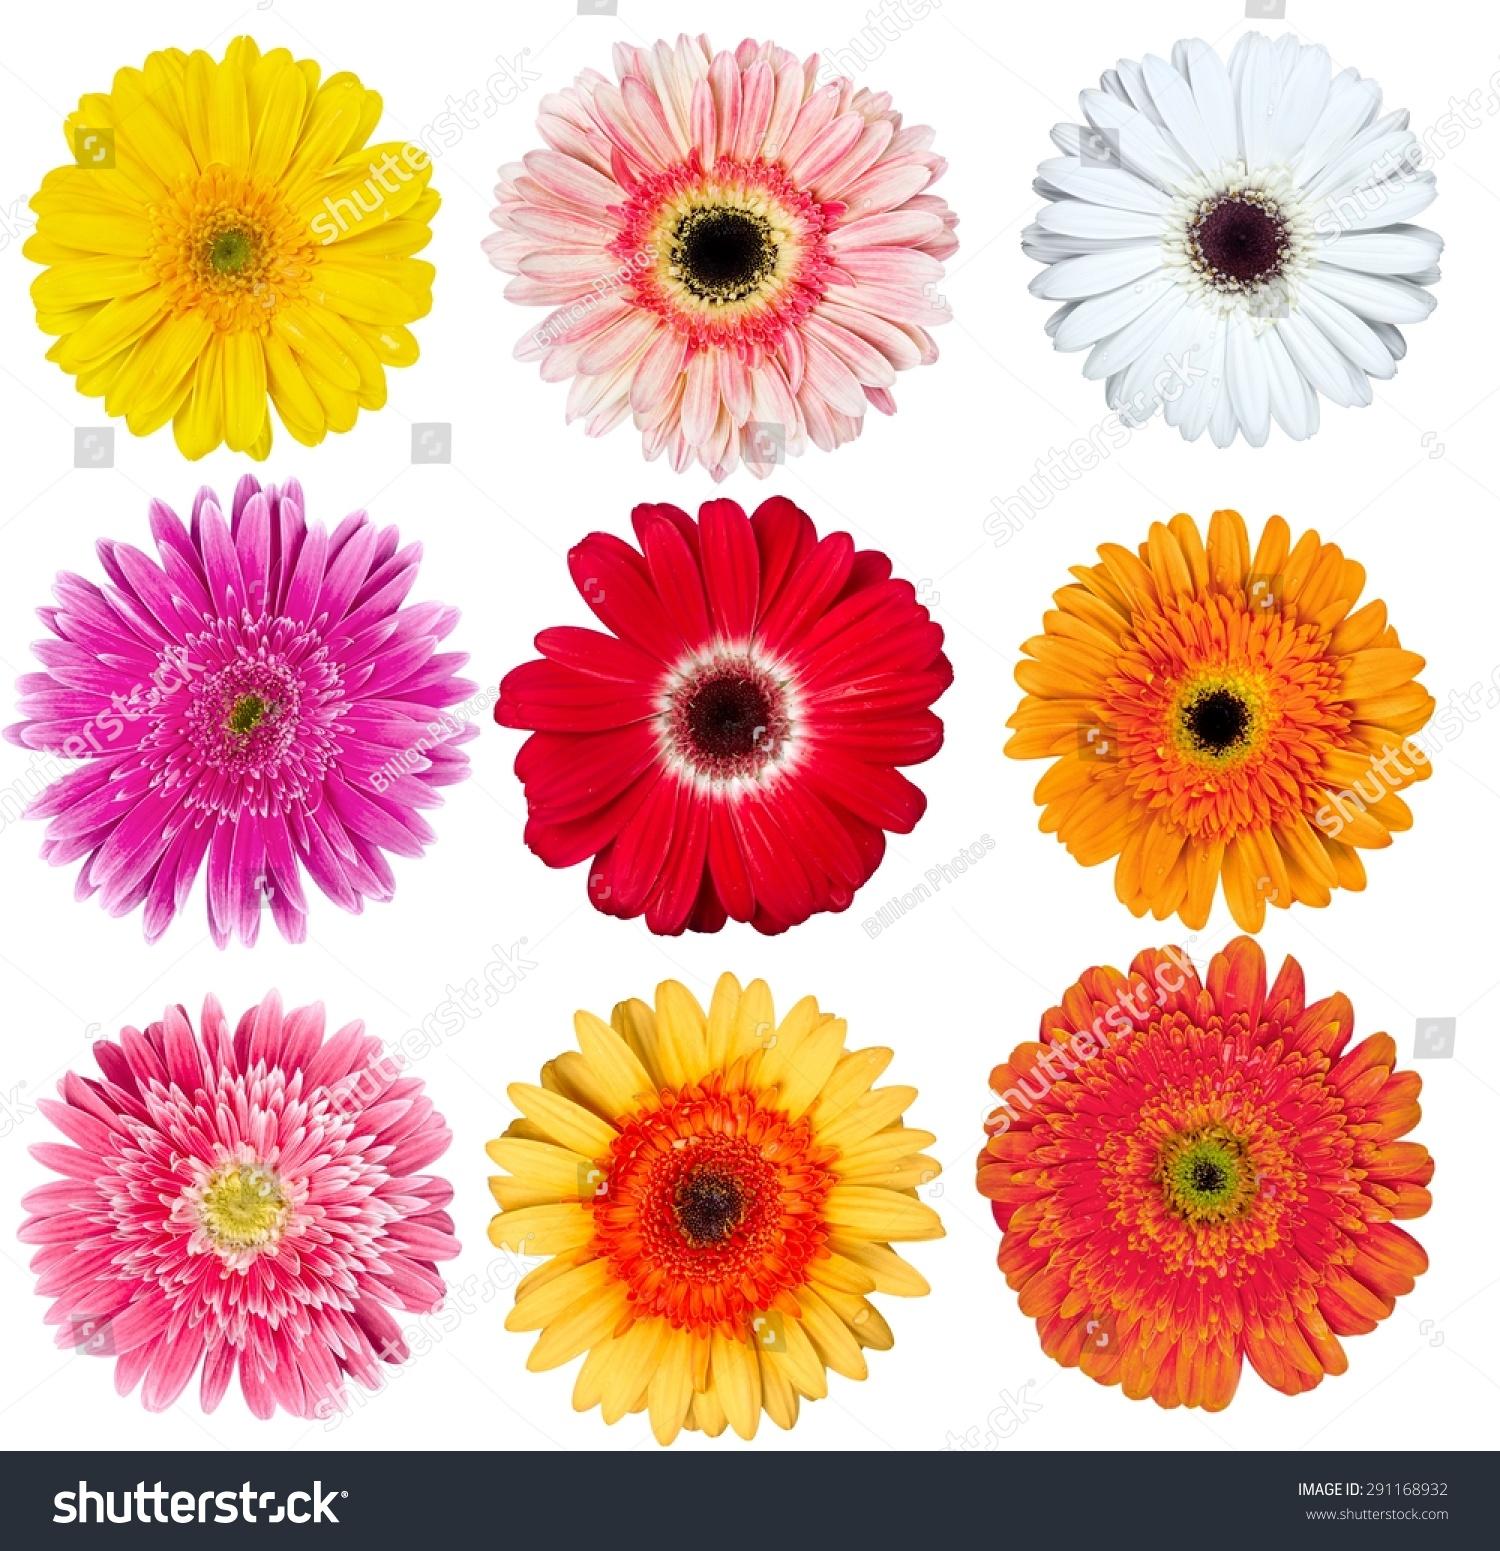 Gerbera Daisy Flower Single Flower Stock Photo (Royalty Free ...